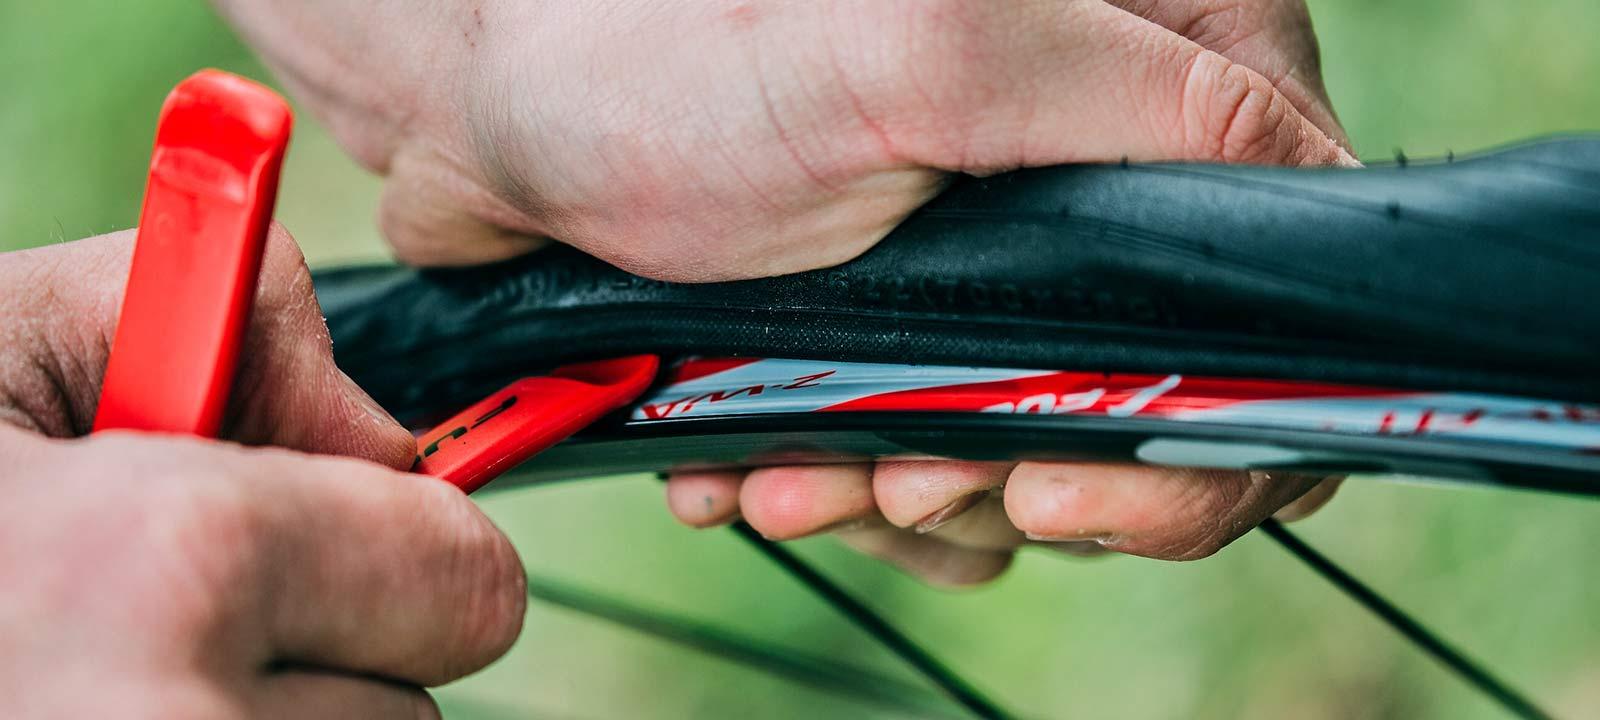 2022 Fulcrum Racing 4, 5, 6 DB alloy road wheels, affordable aluminum tubeless